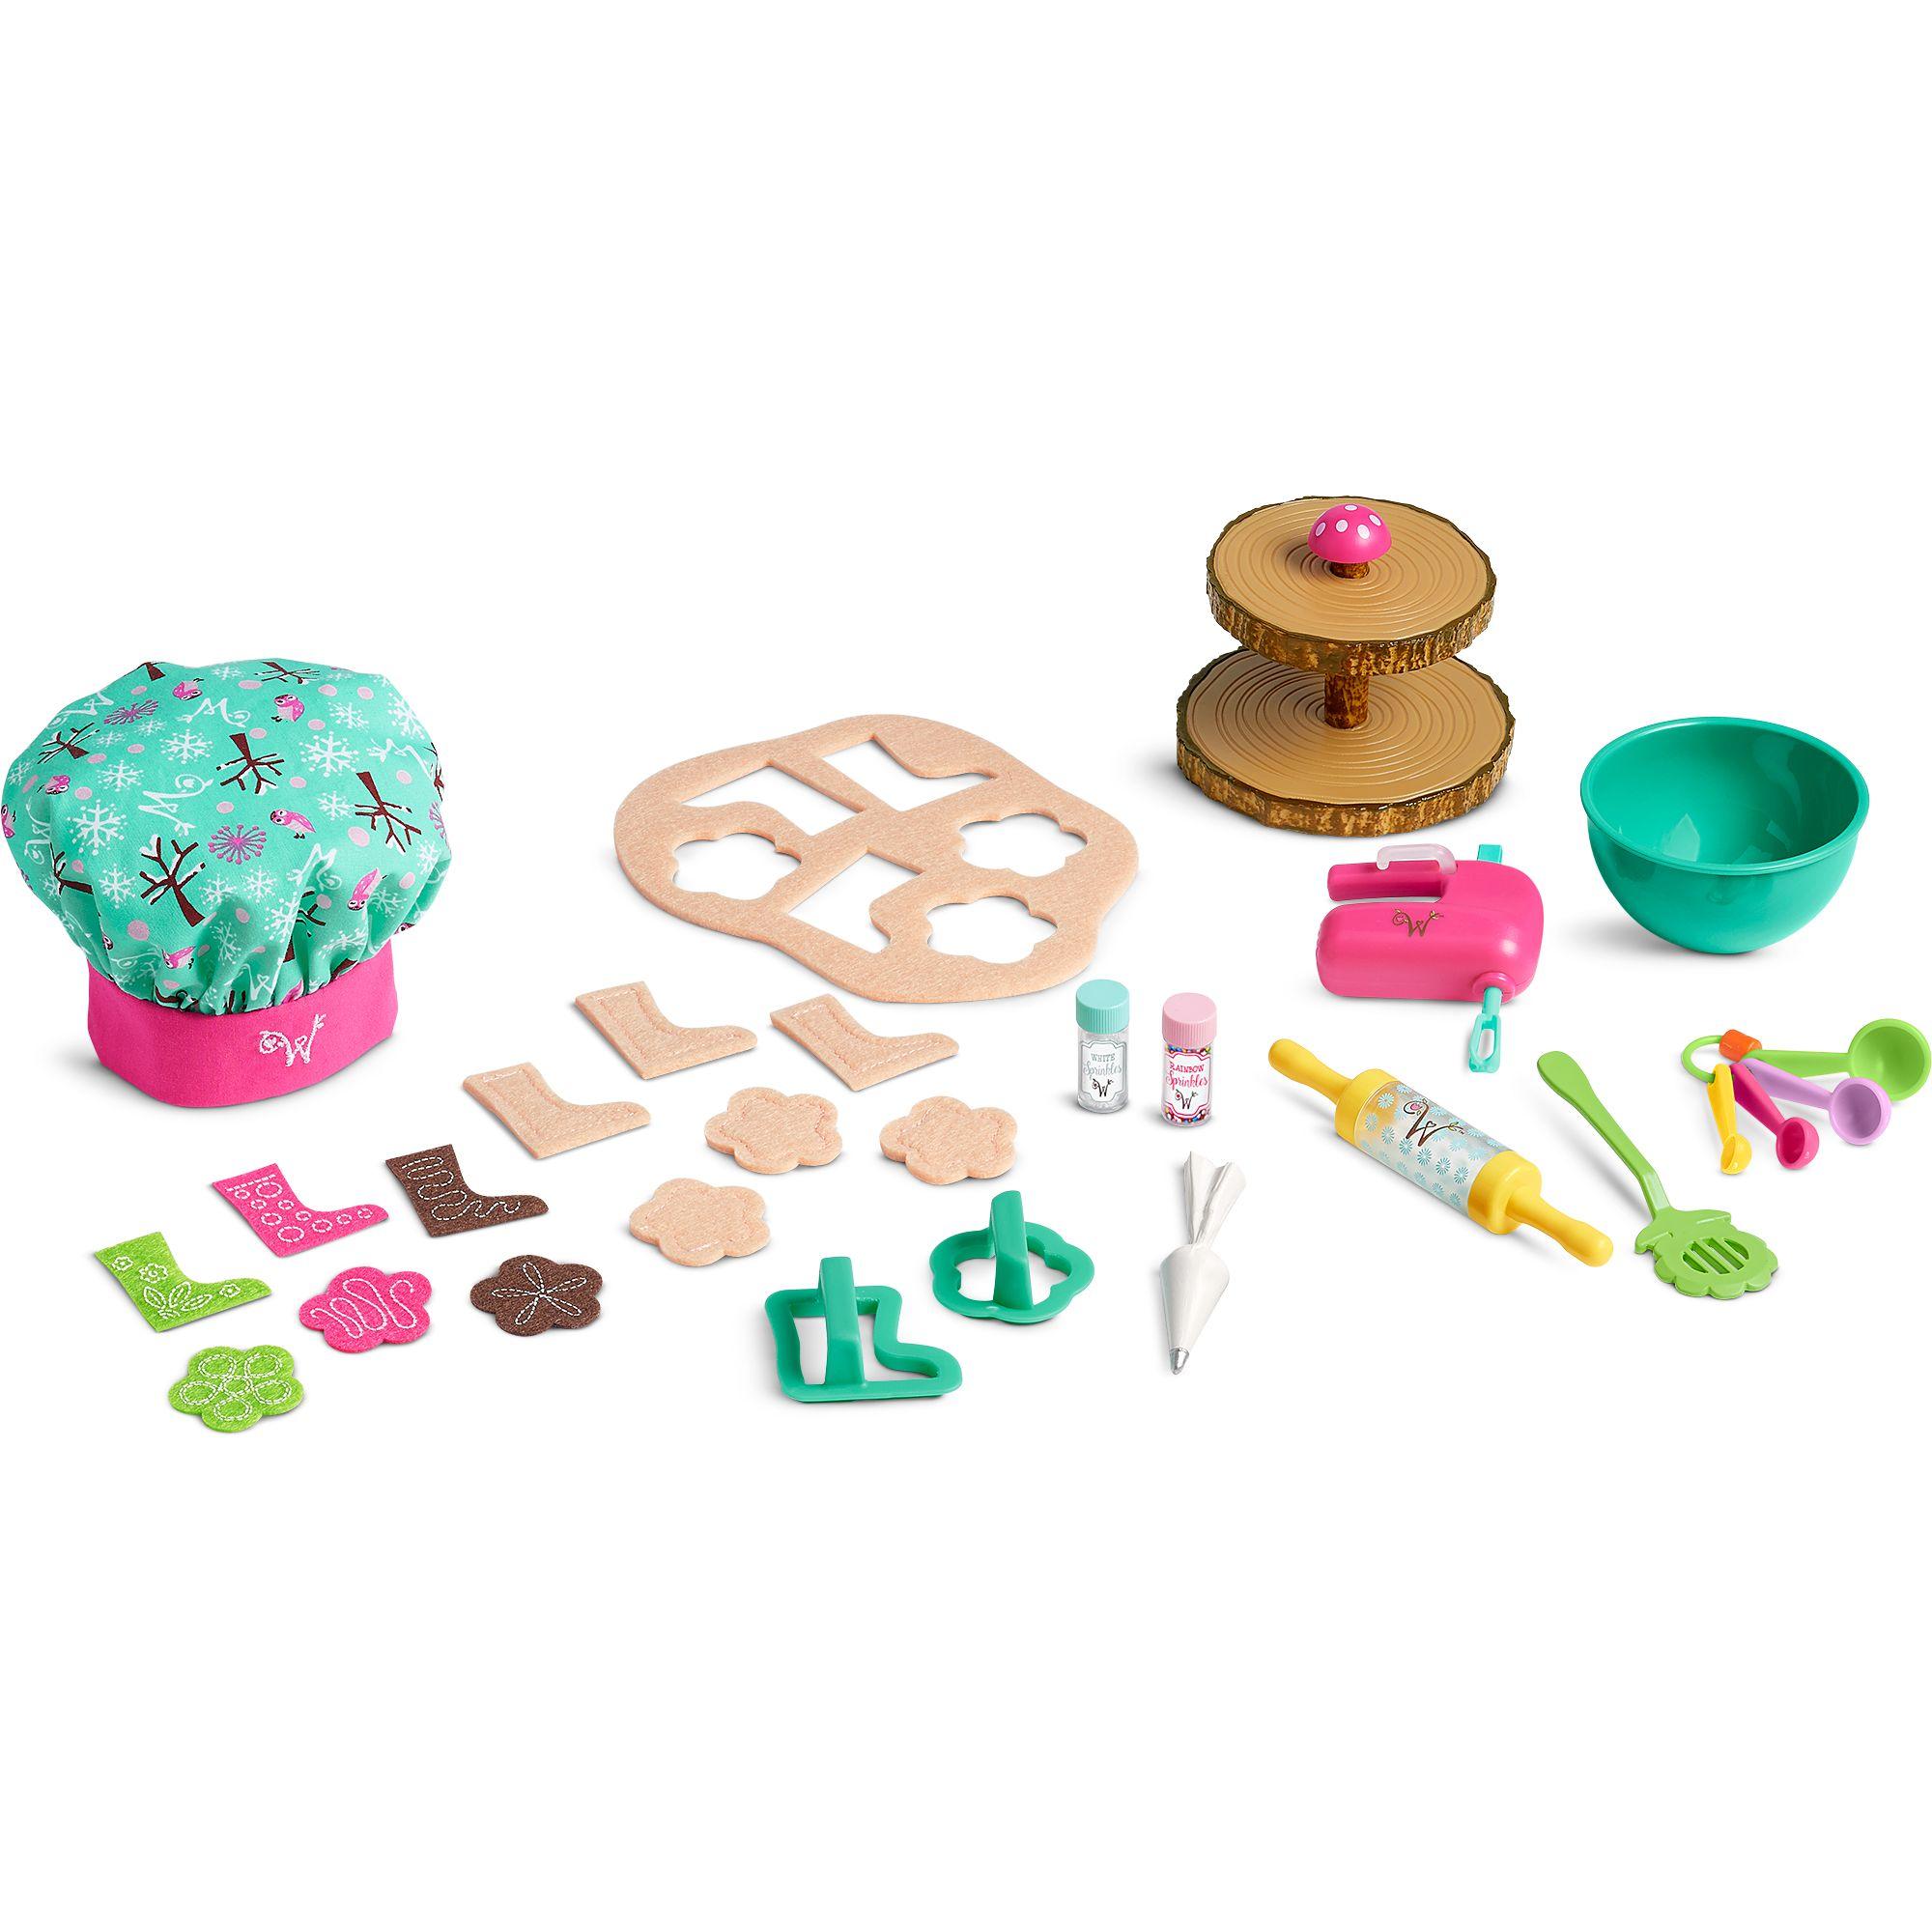 Cookie Baking Set (WW)